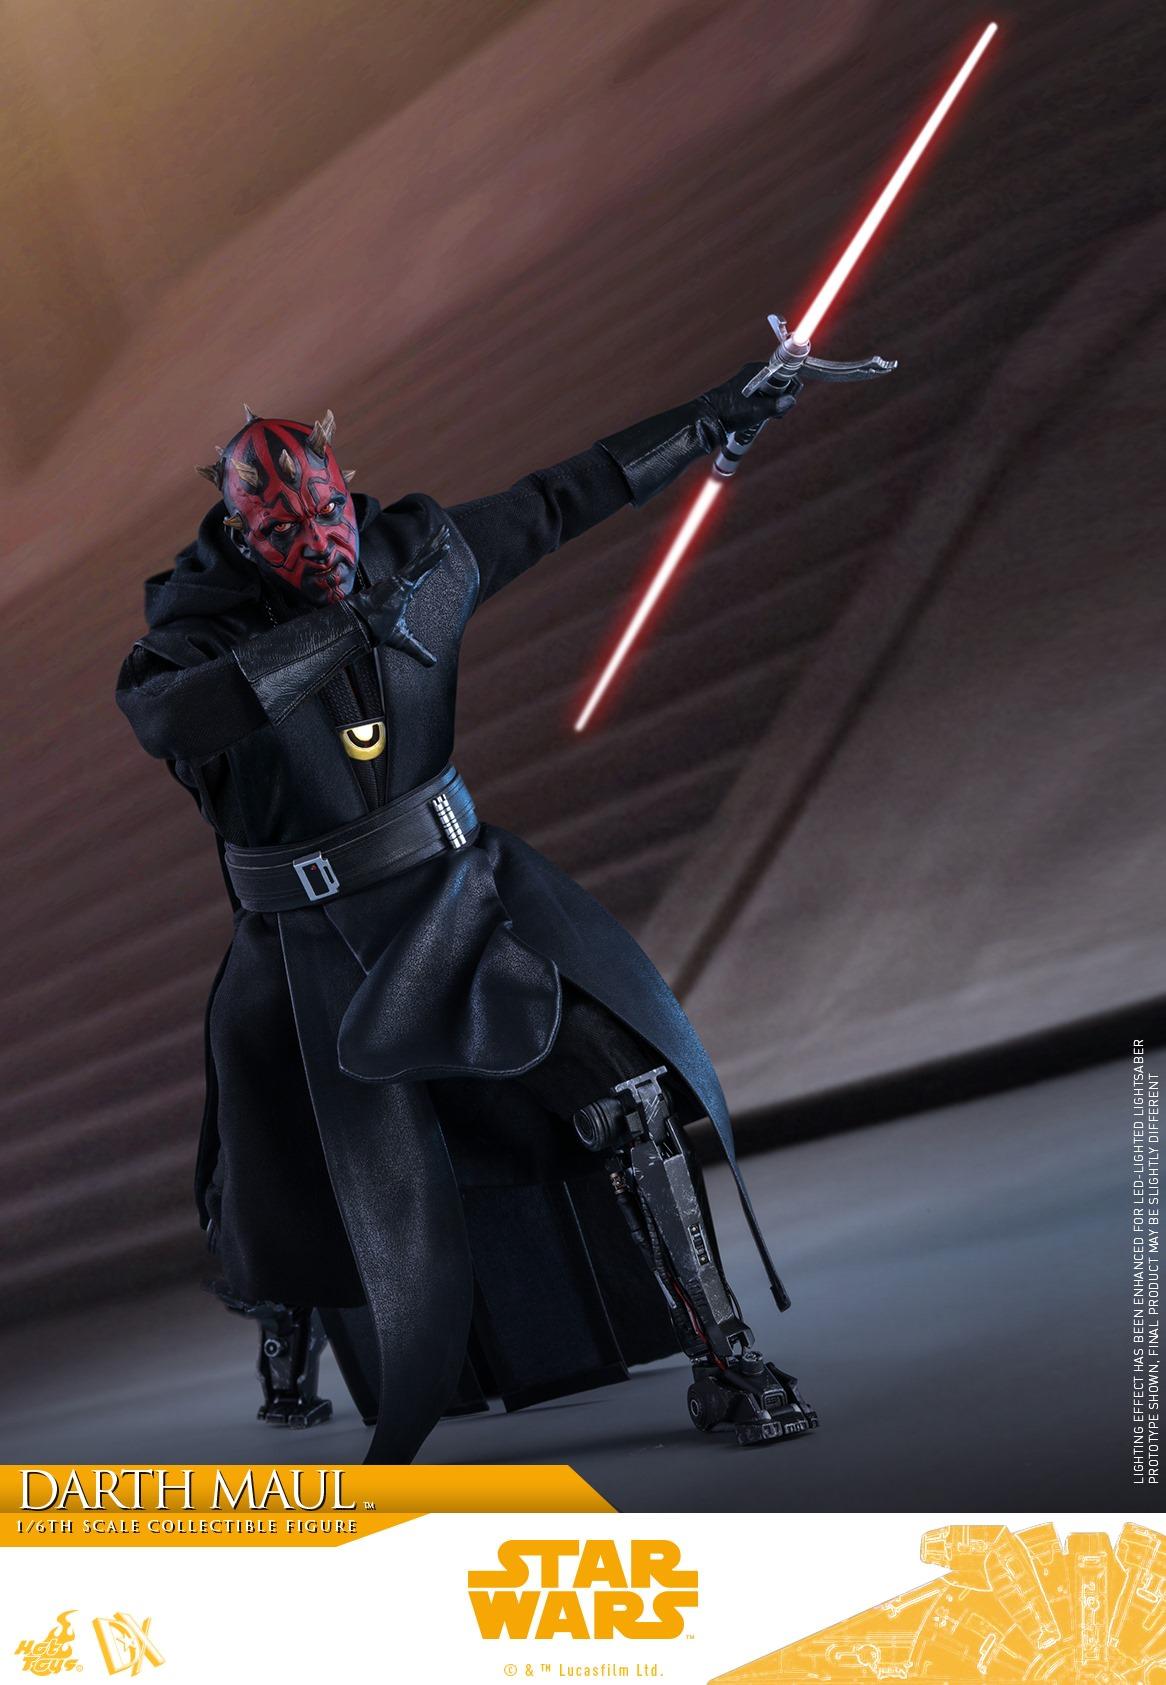 Hot Toys DX Darth Maul zu Solo: A Star Wars Story